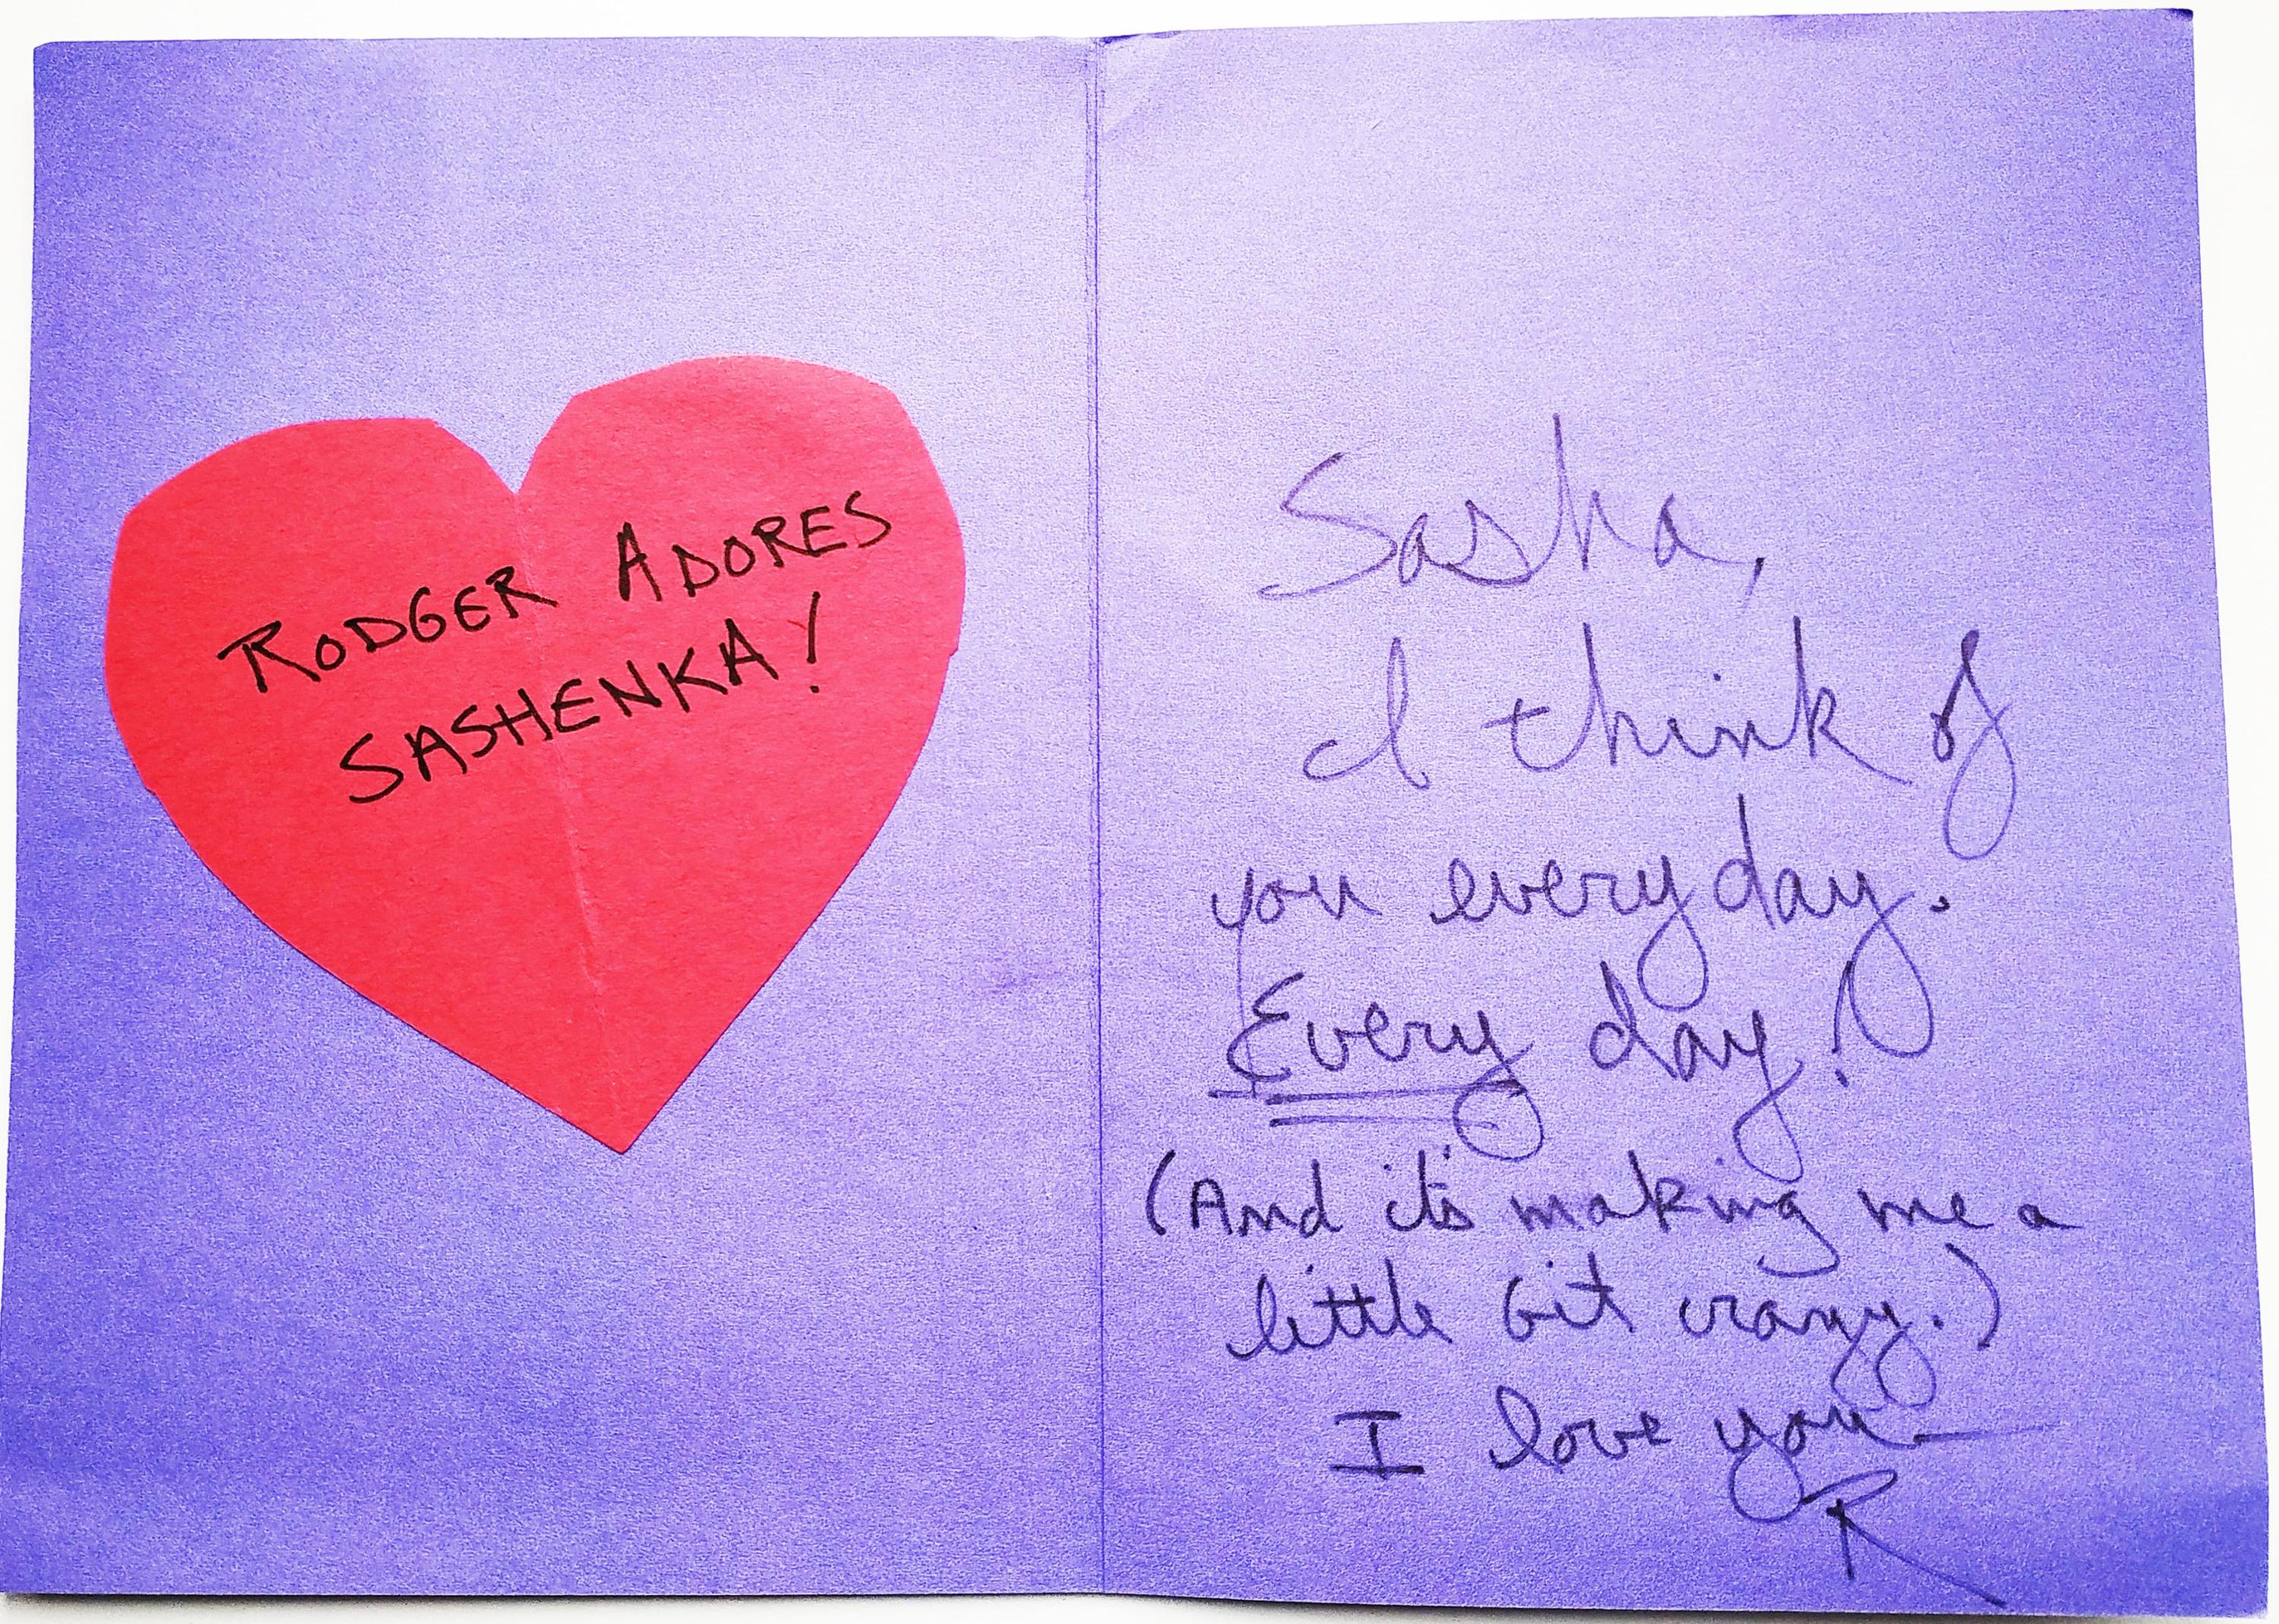 Та самая любовная открытка от Роджера